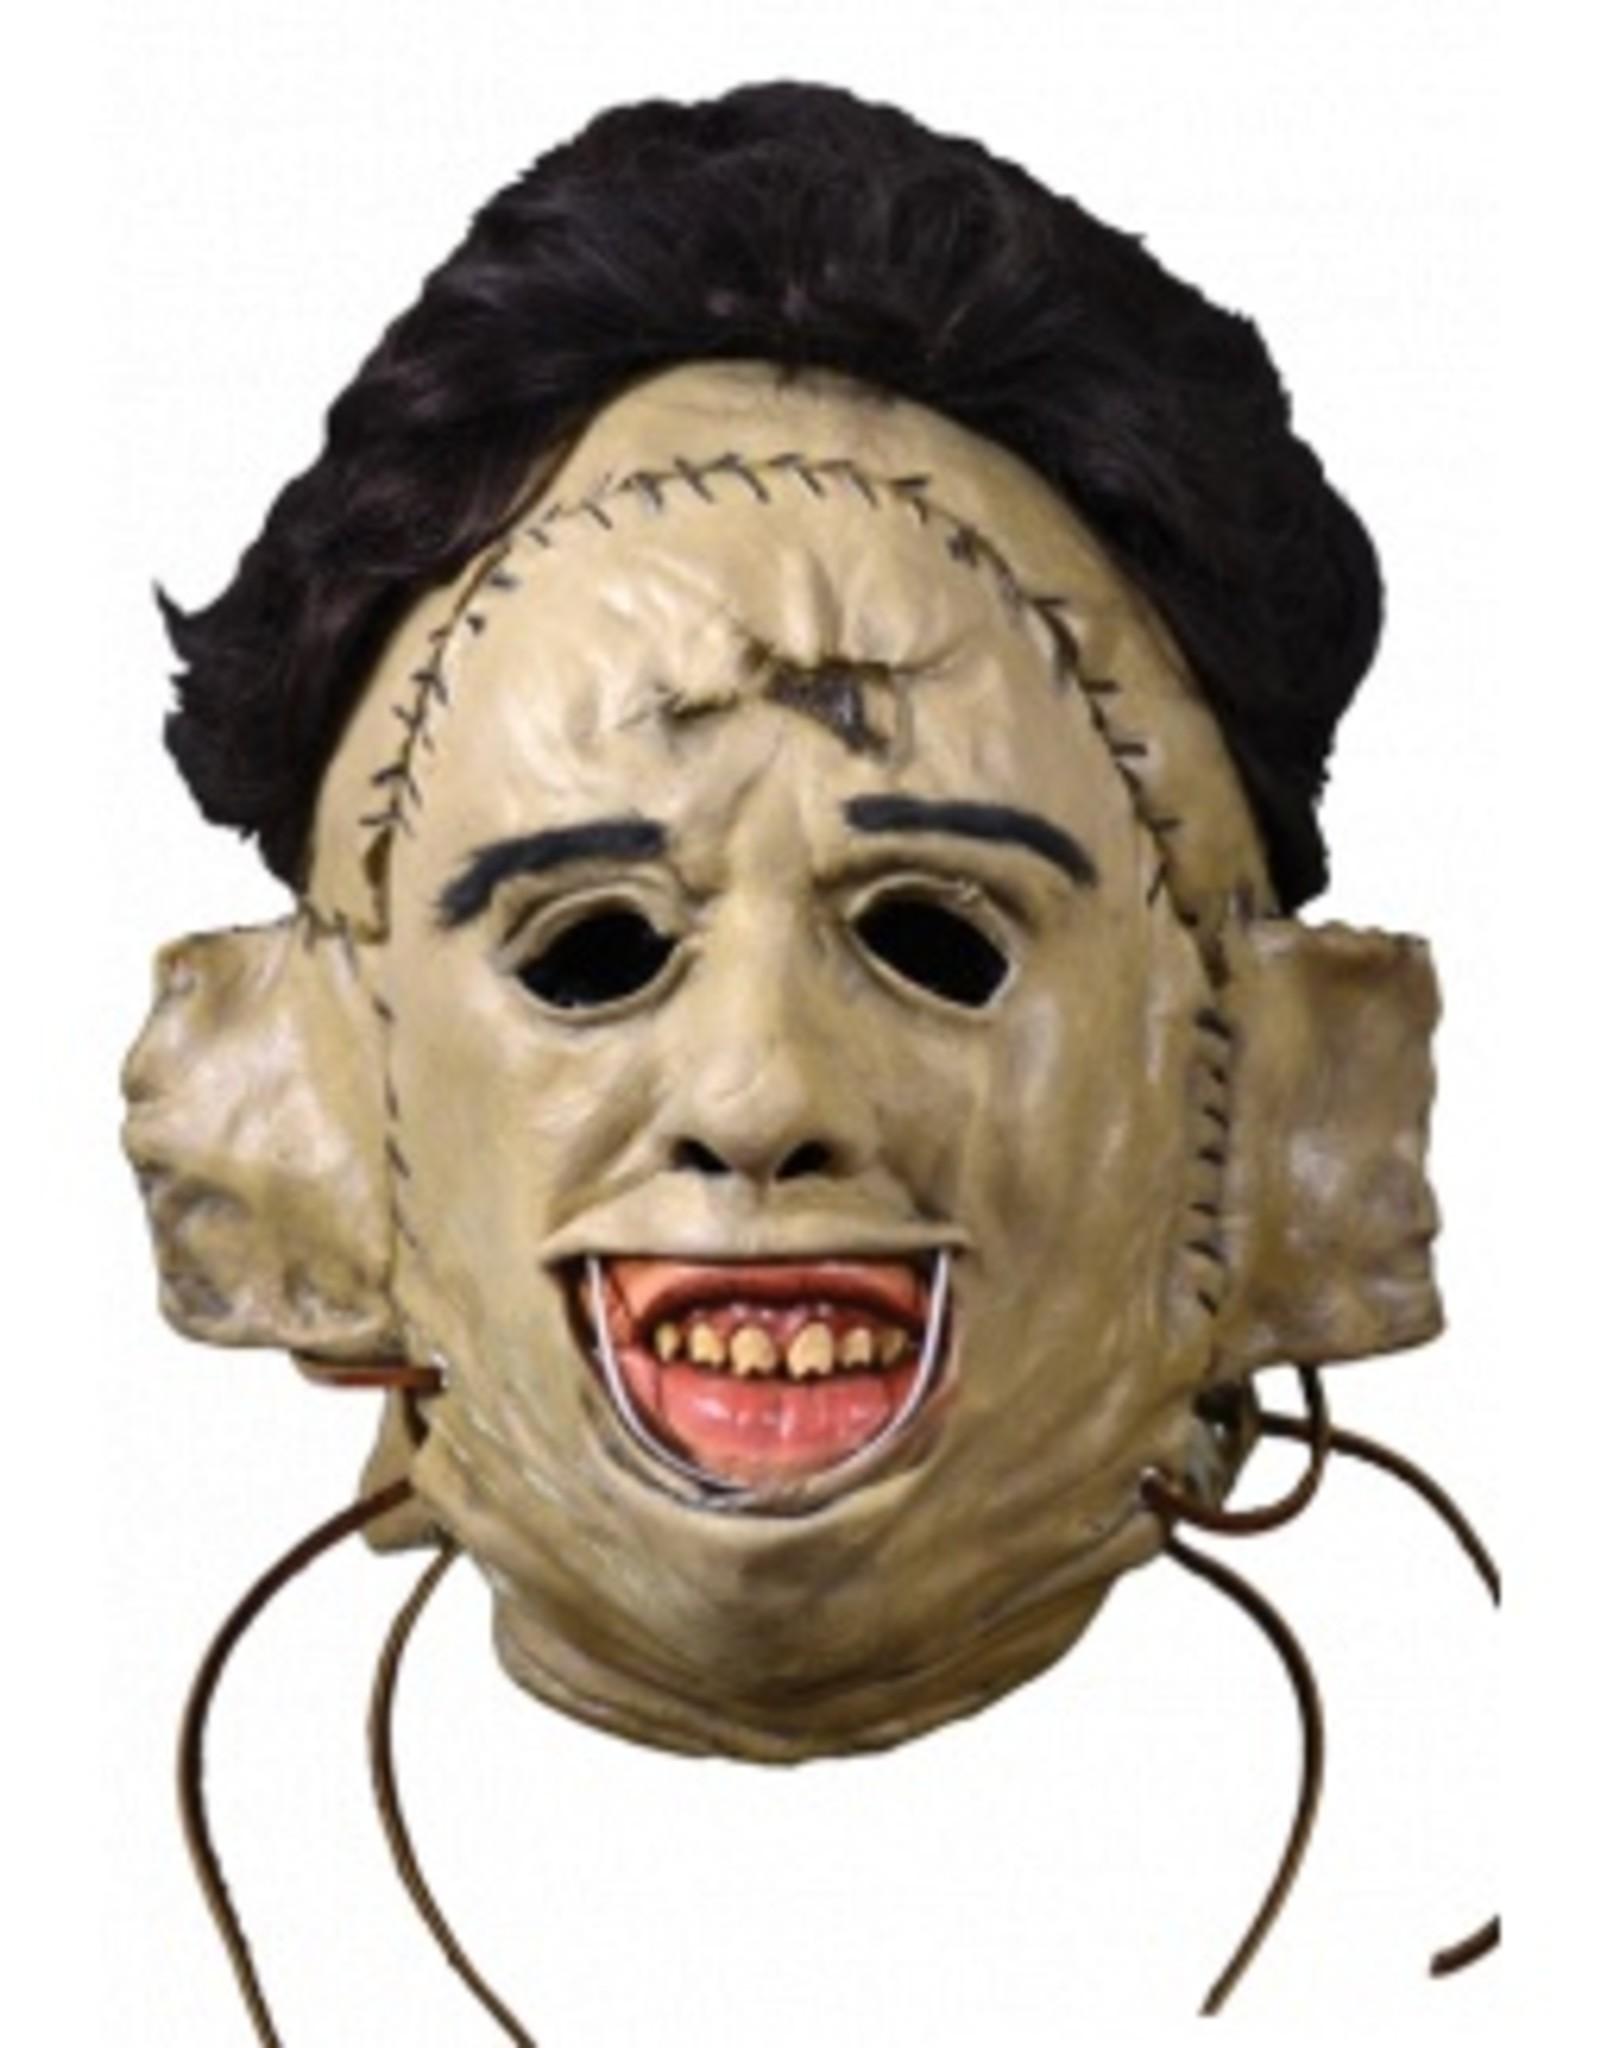 Trick or Treat Studios Leatherface Killing Mask